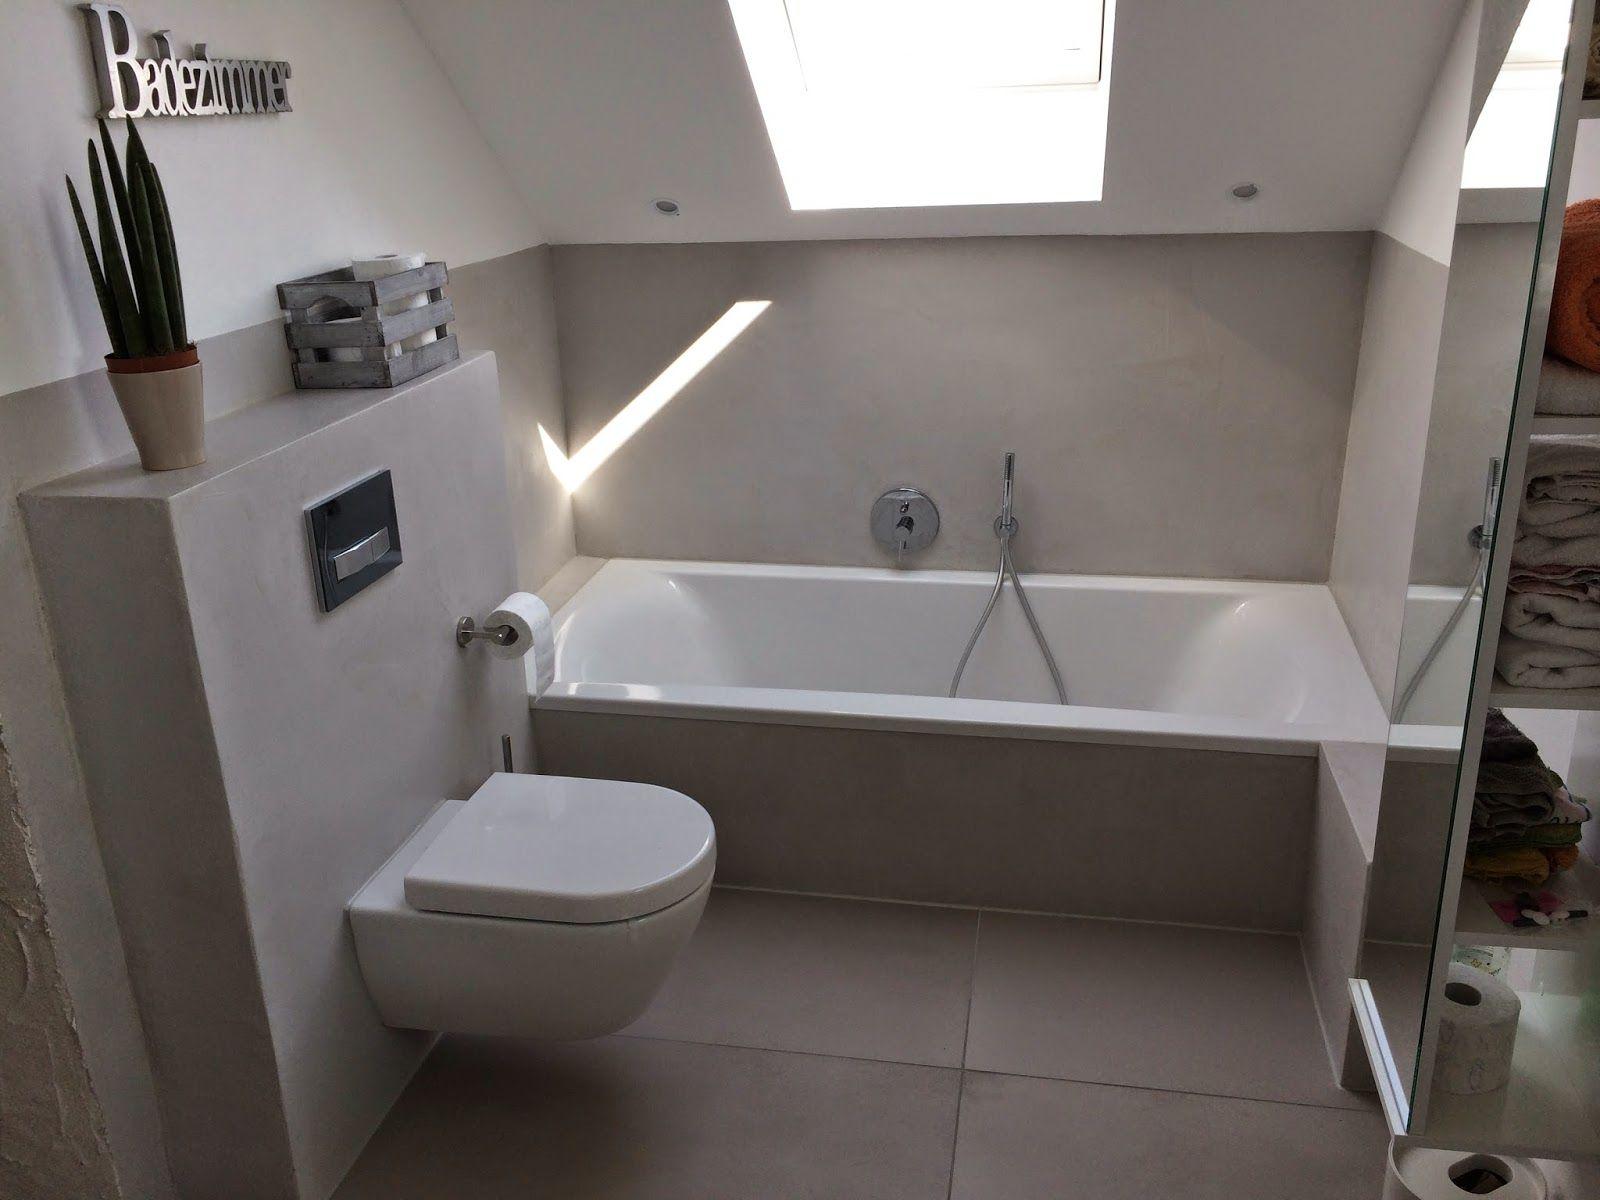 Beton Cire Beton Floor Preise Betonoptik Microtopping Kosten Kaufen Preise Verarbeitung Fugenlose Boden Microz Neues Badezimmer Badezimmer Betonoptik